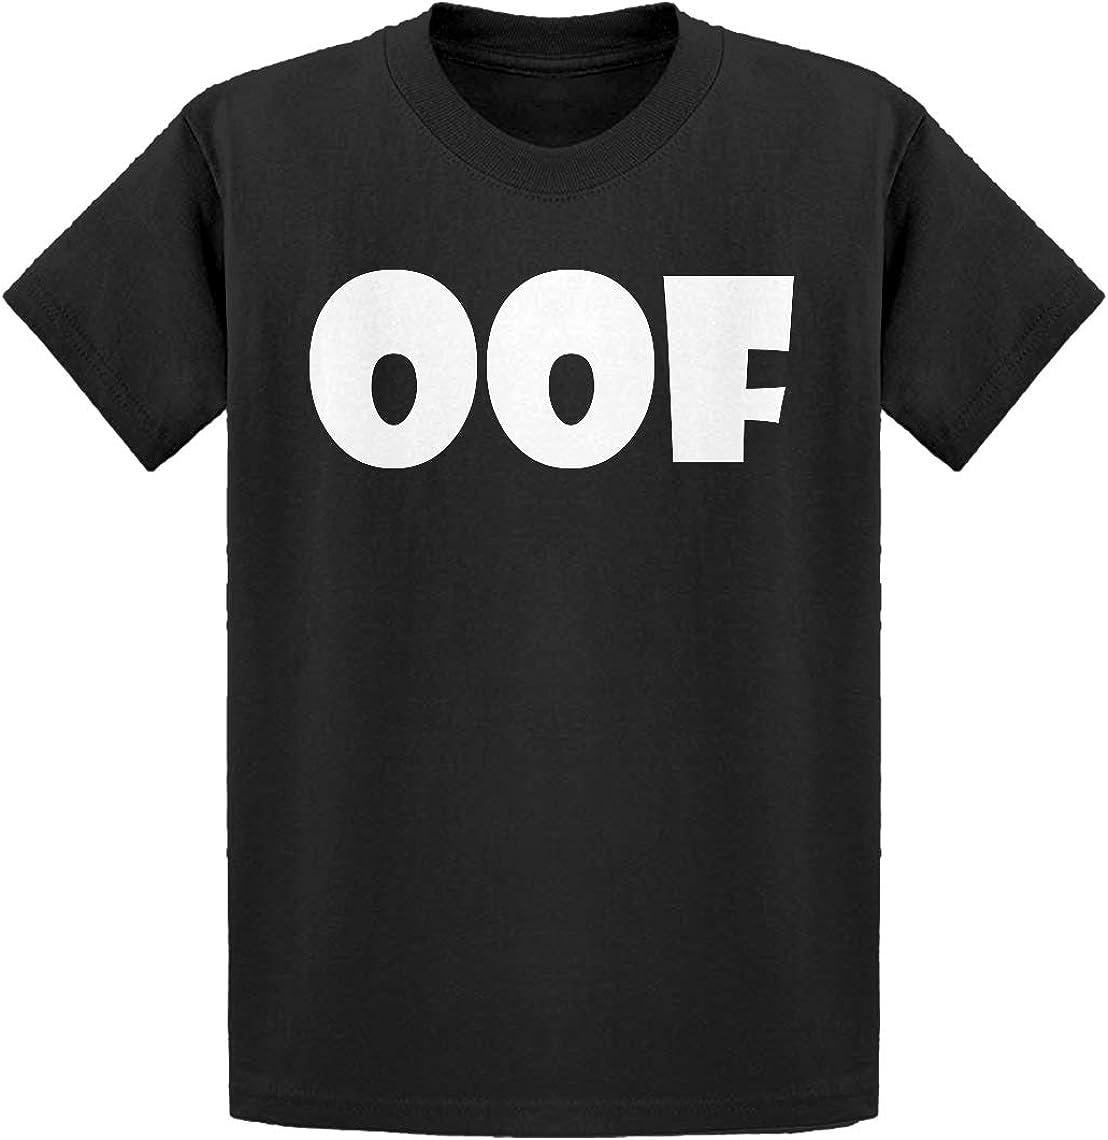 Storm Area 51 Shirts Oof Kids T-Shirt